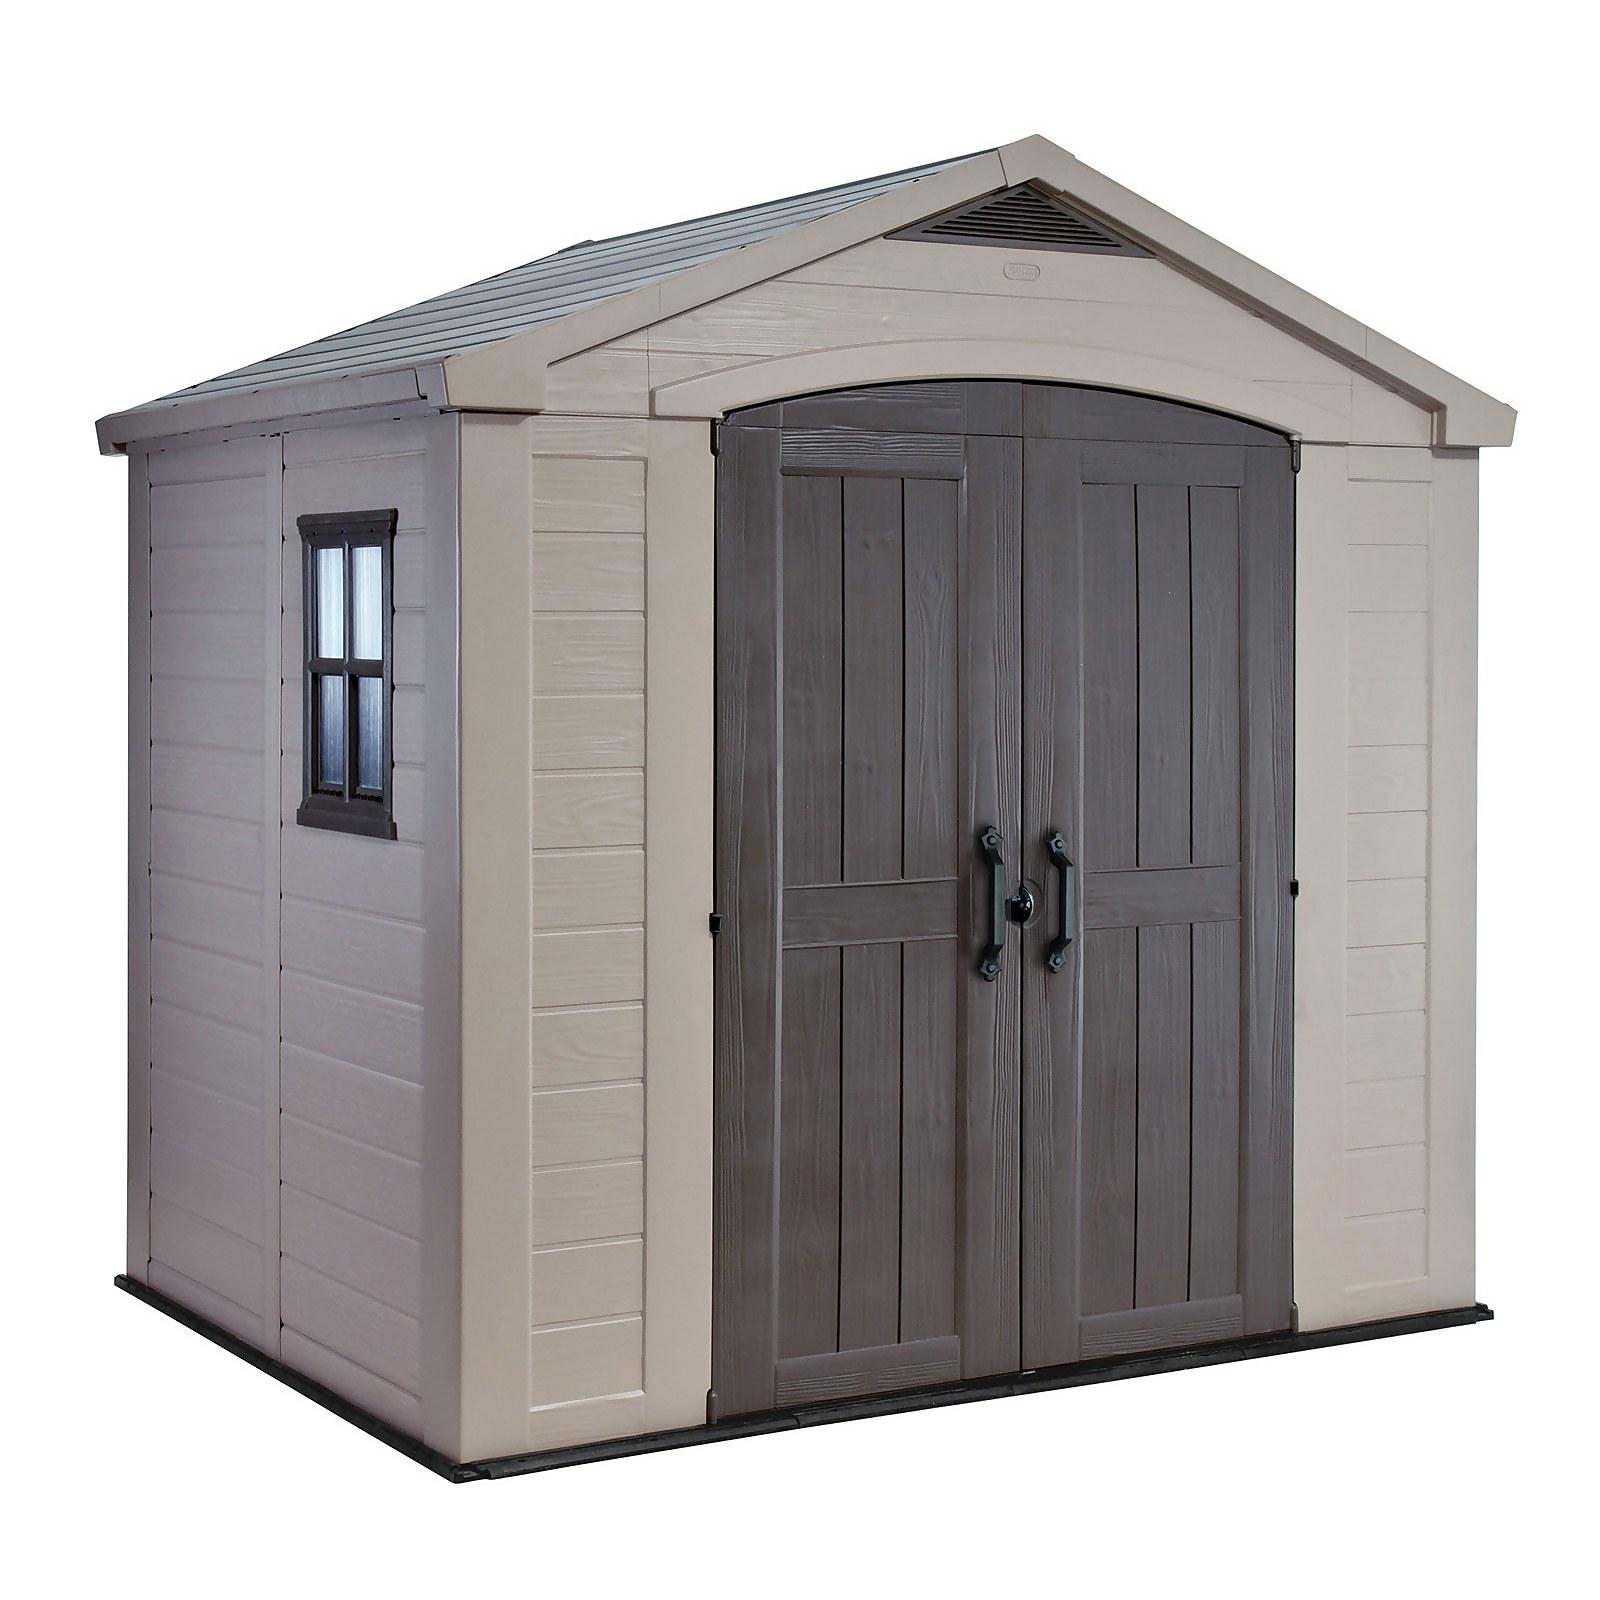 Keter Factor 8 x 6ft Outdoor Garden Apex Storage Shed - Beige/Brown